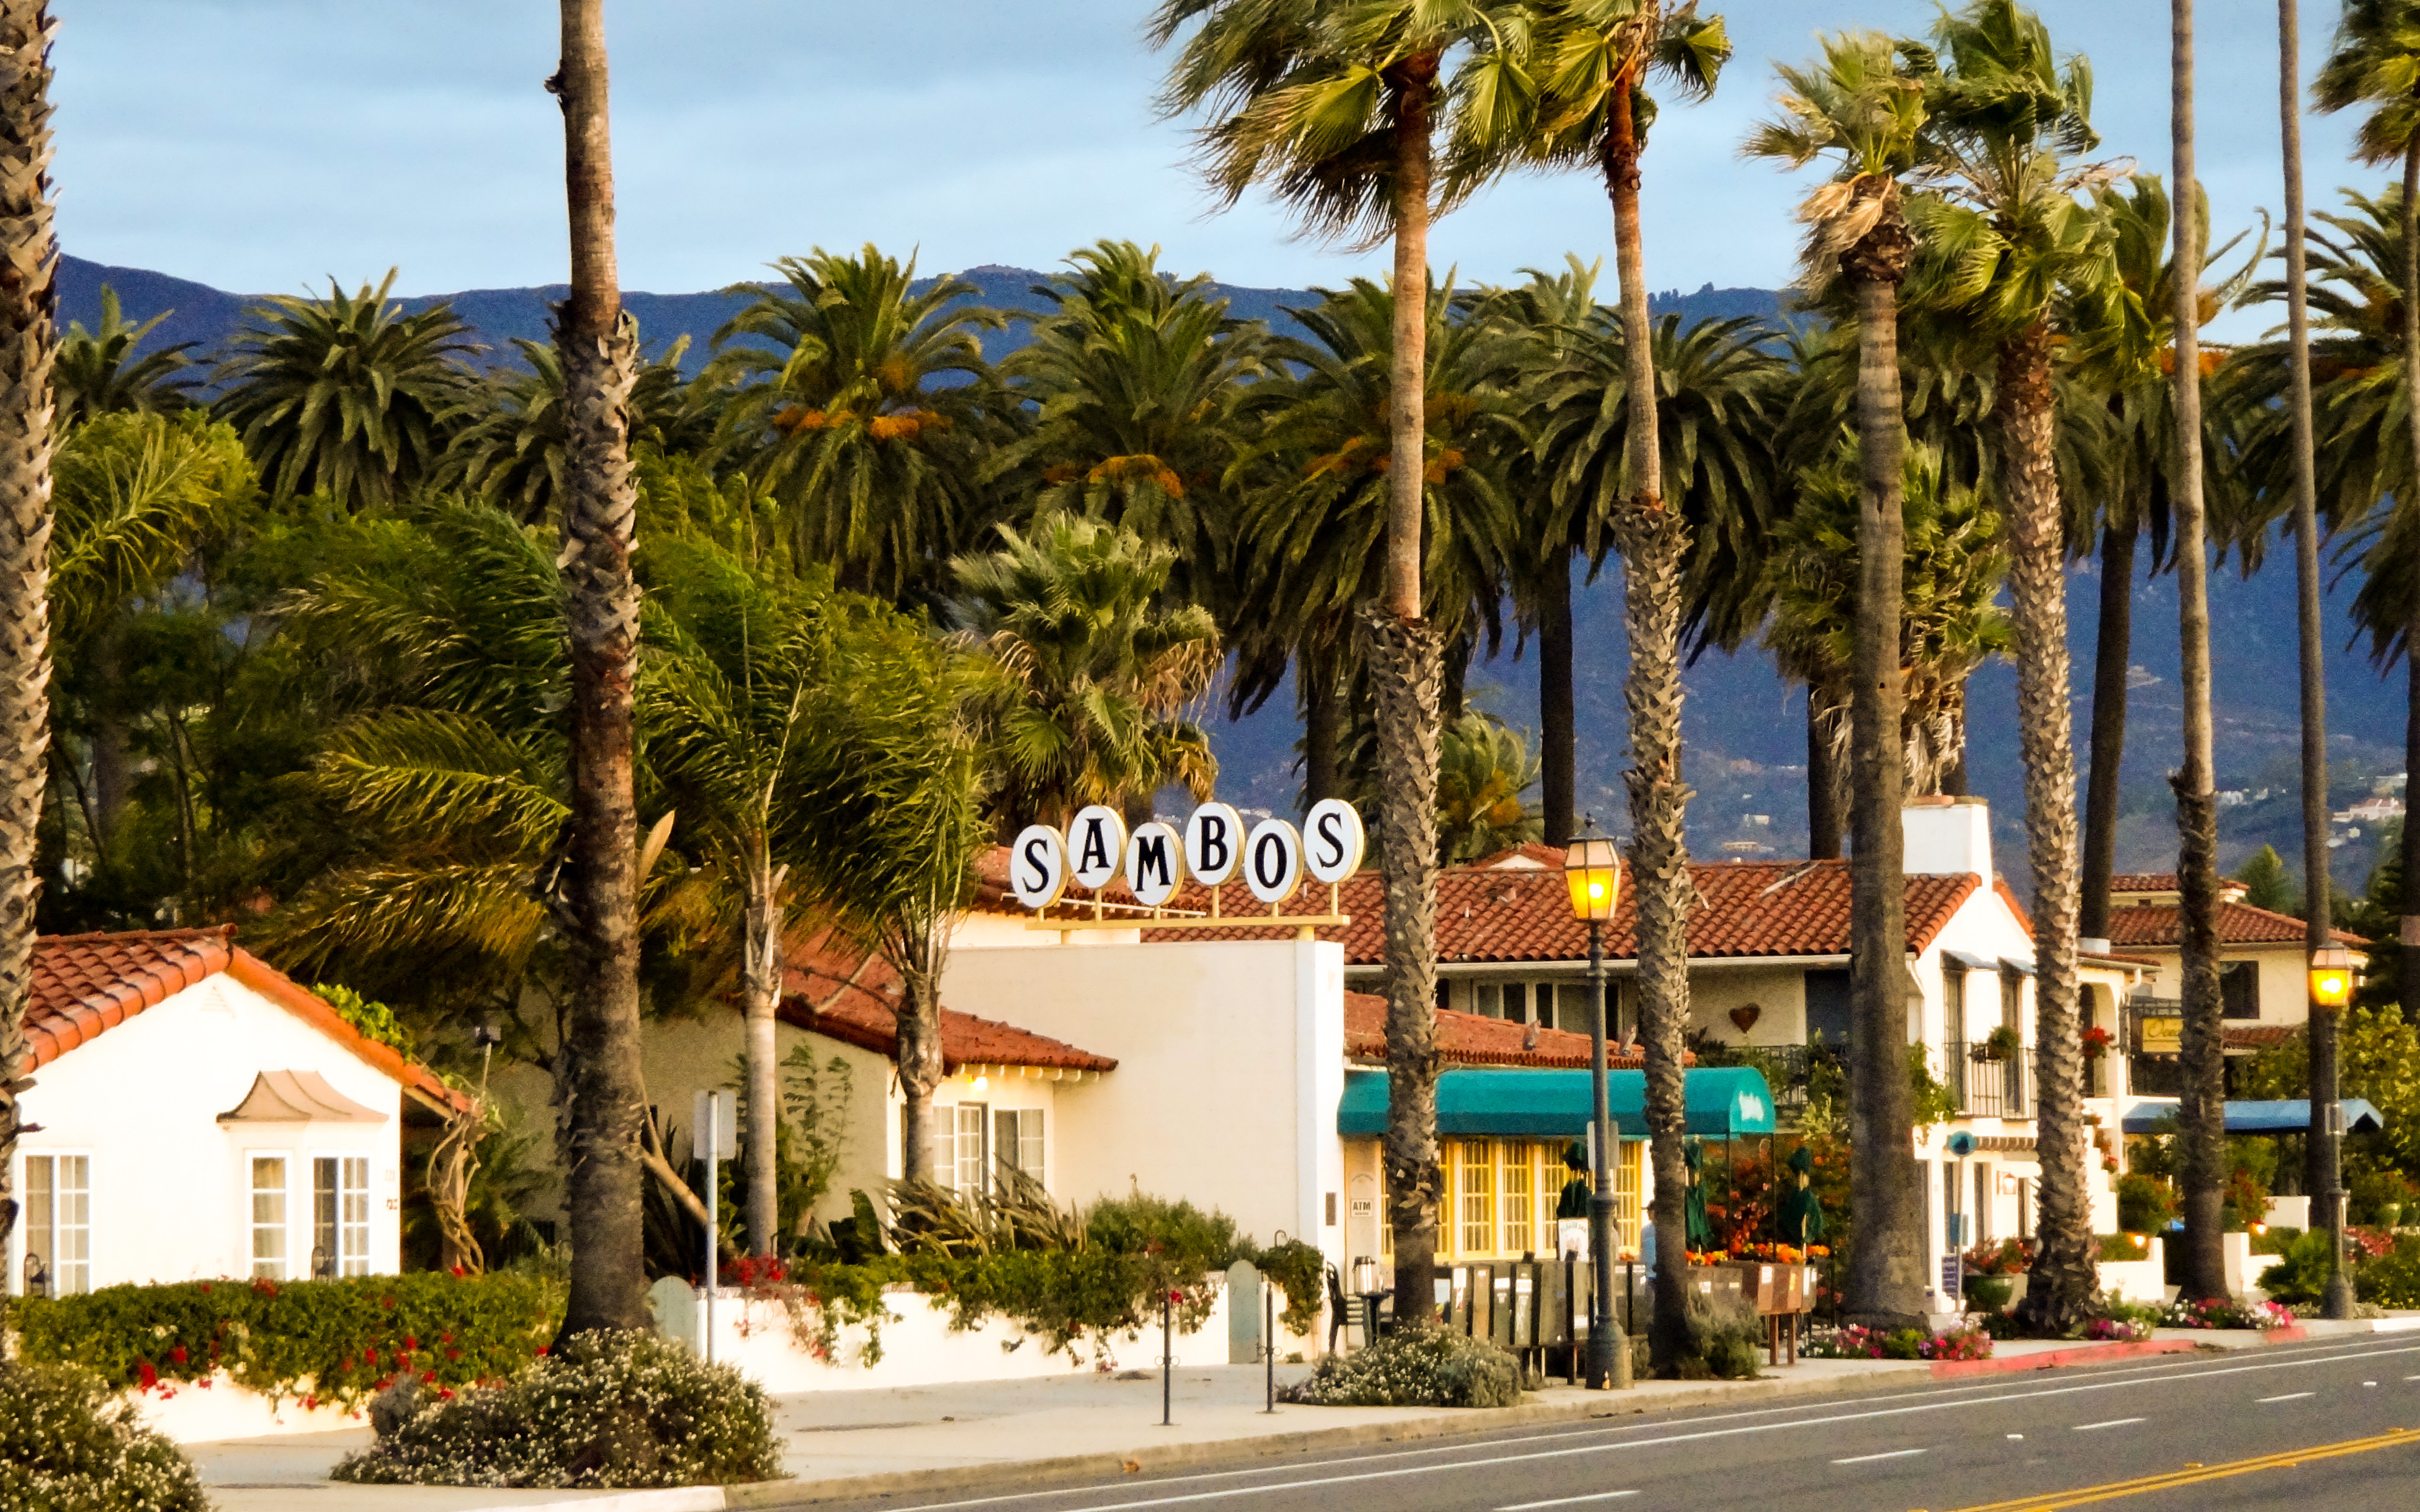 Santa Barbara Sunrise Desktops By Terry Majamaki